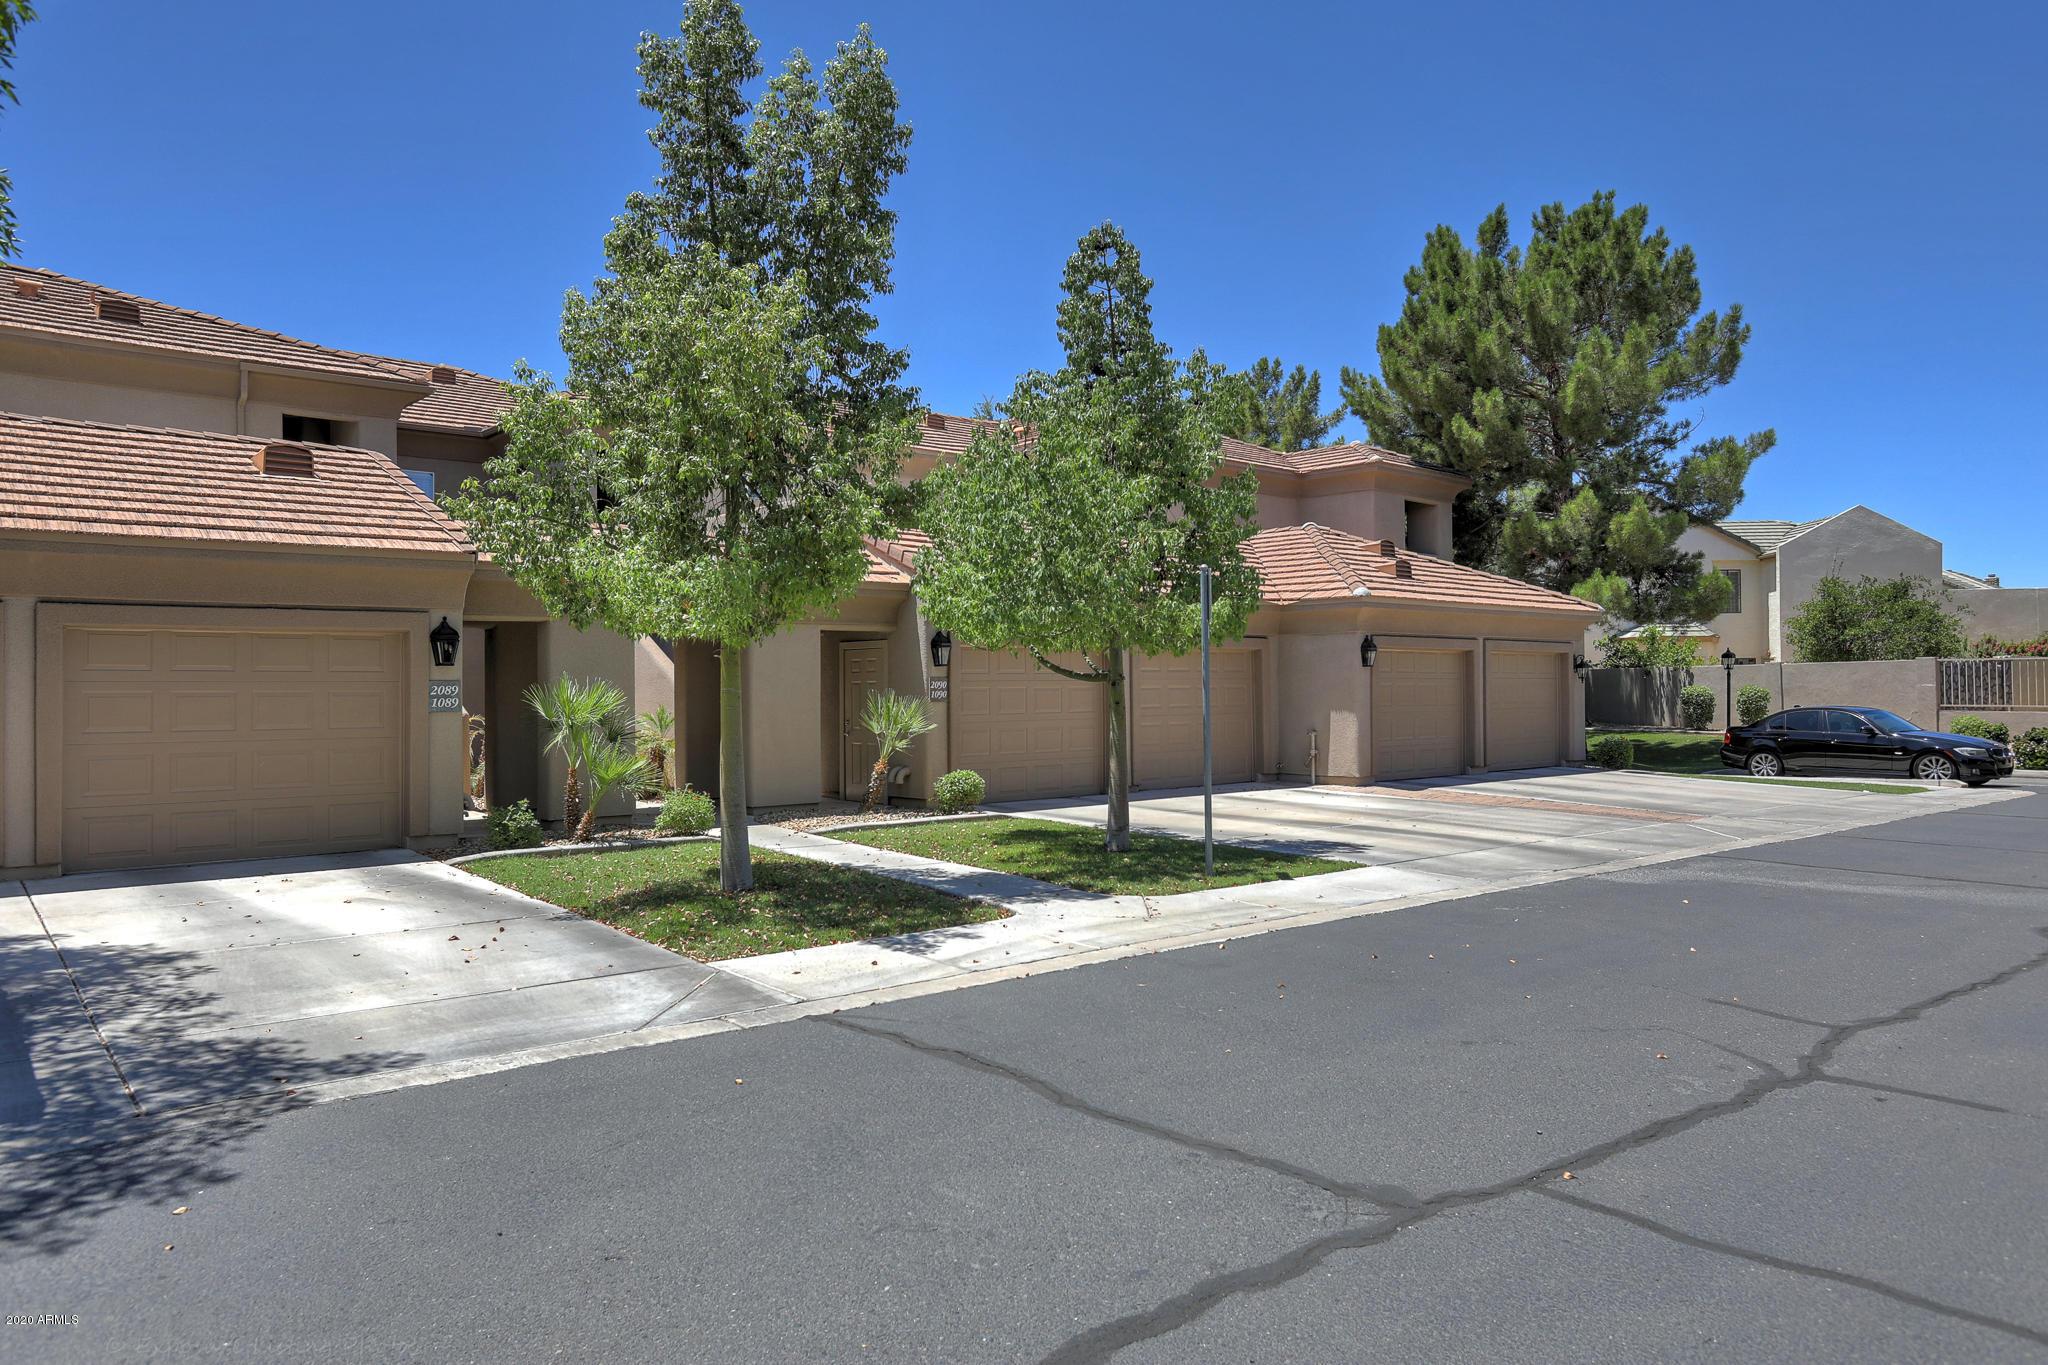 Photo of 7401 W ARROWHEAD CLUBHOUSE Drive #2089, Glendale, AZ 85308